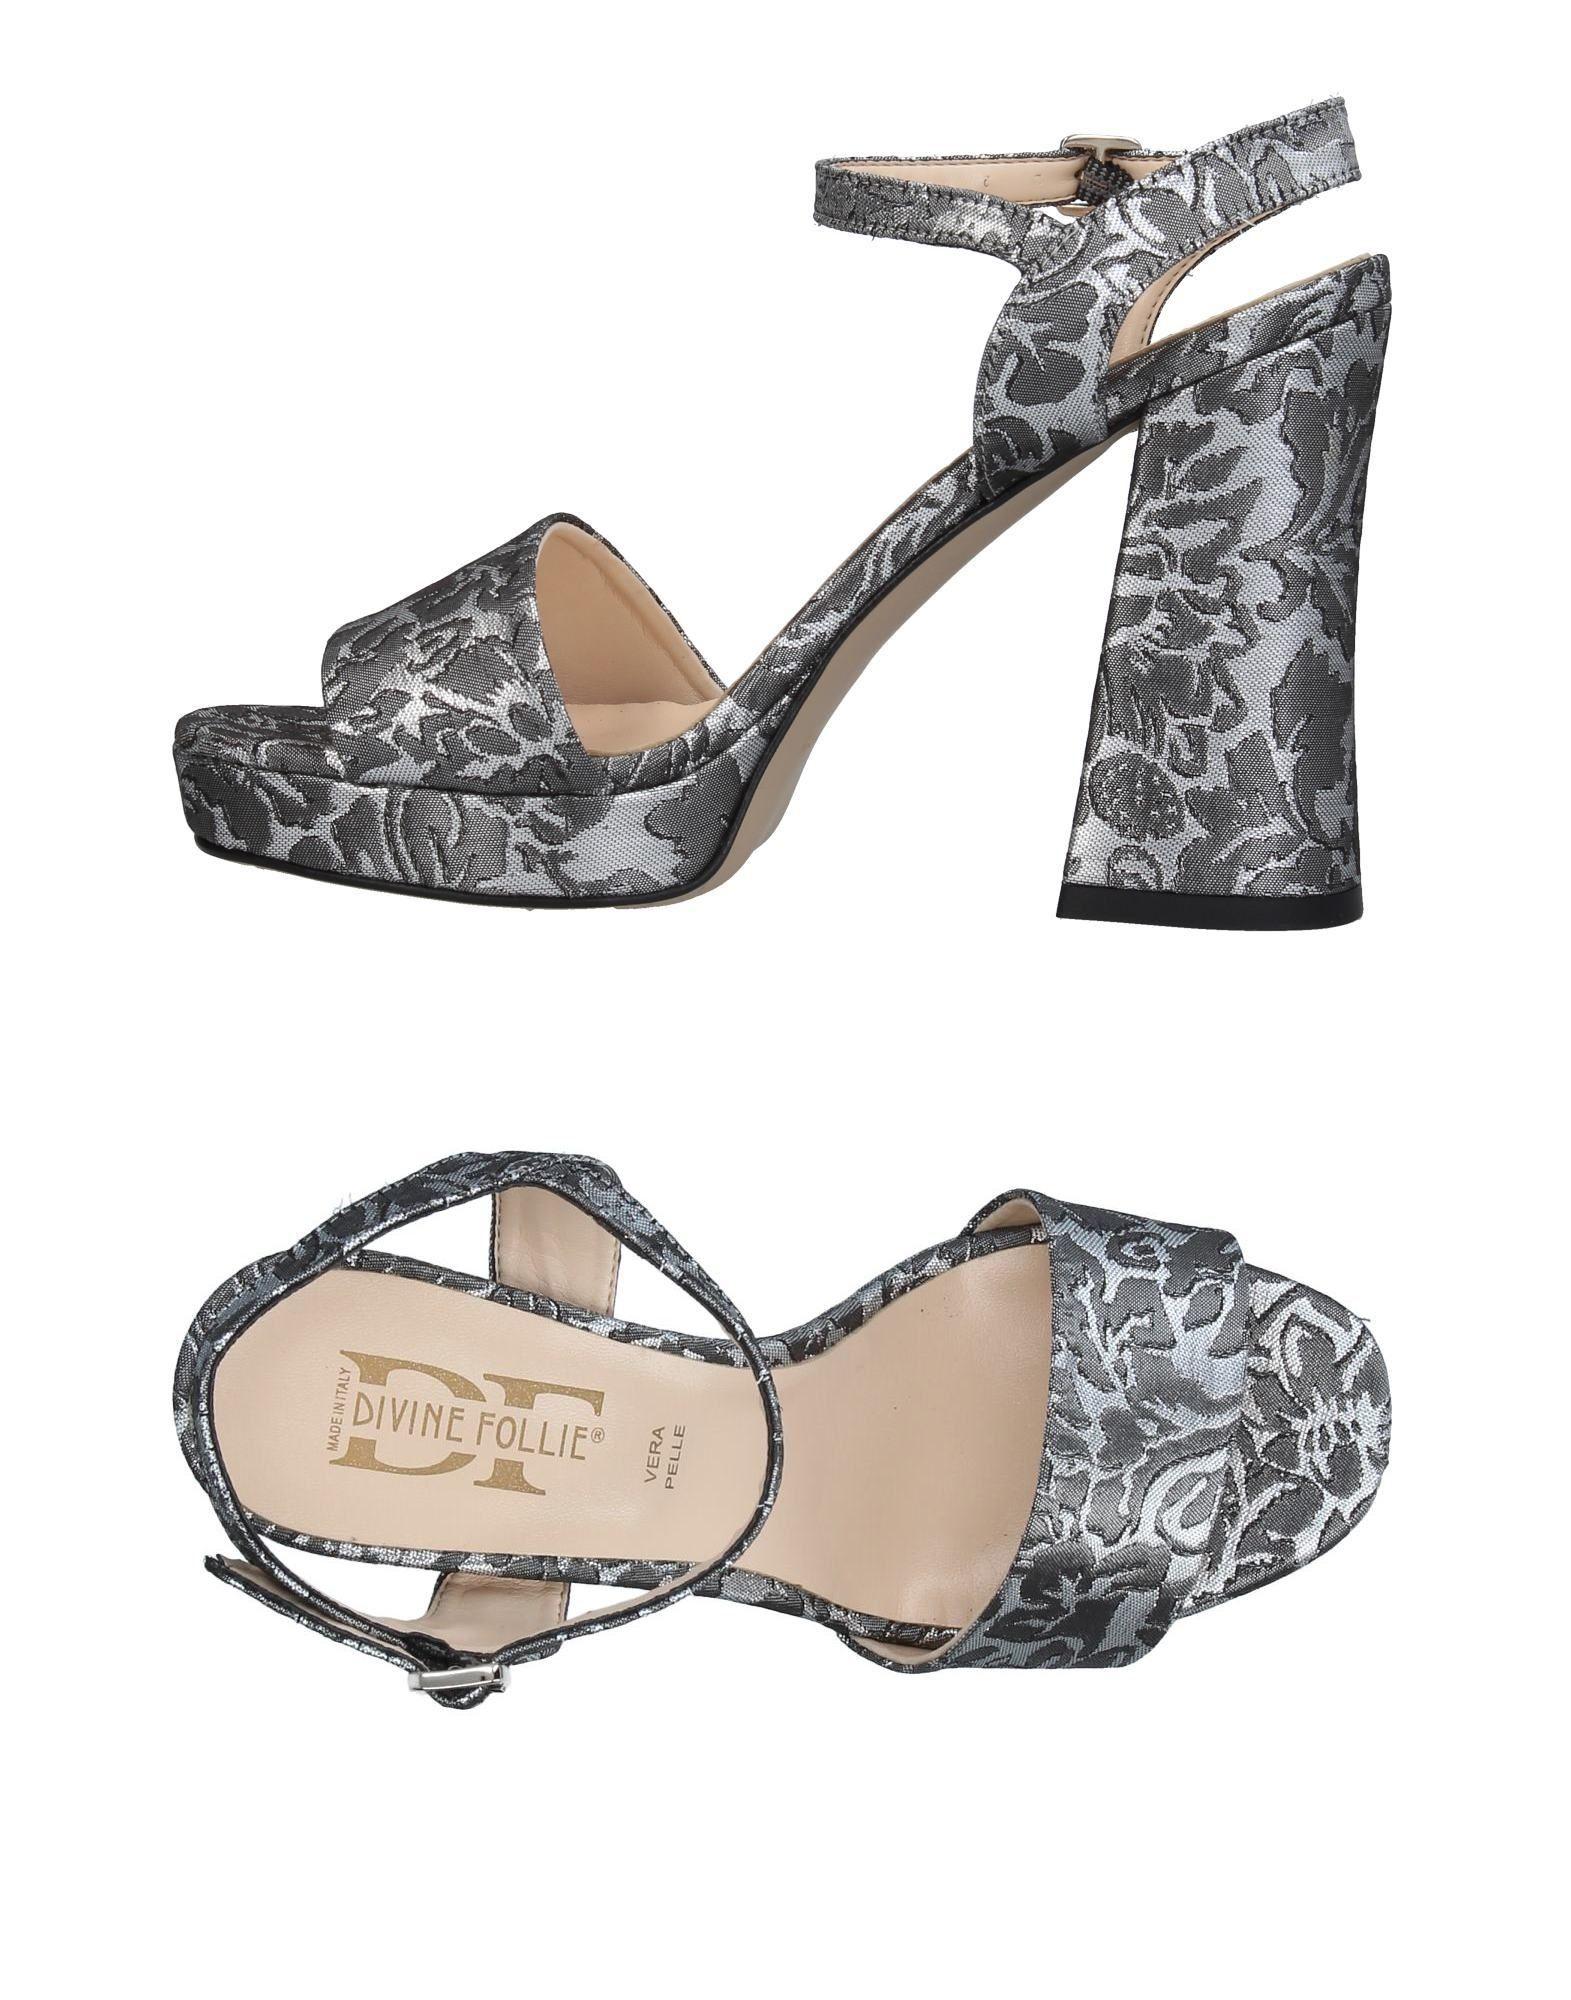 DIVINE FOLLIE Damen Sandale Farbe Grau Größe 9 - broschei